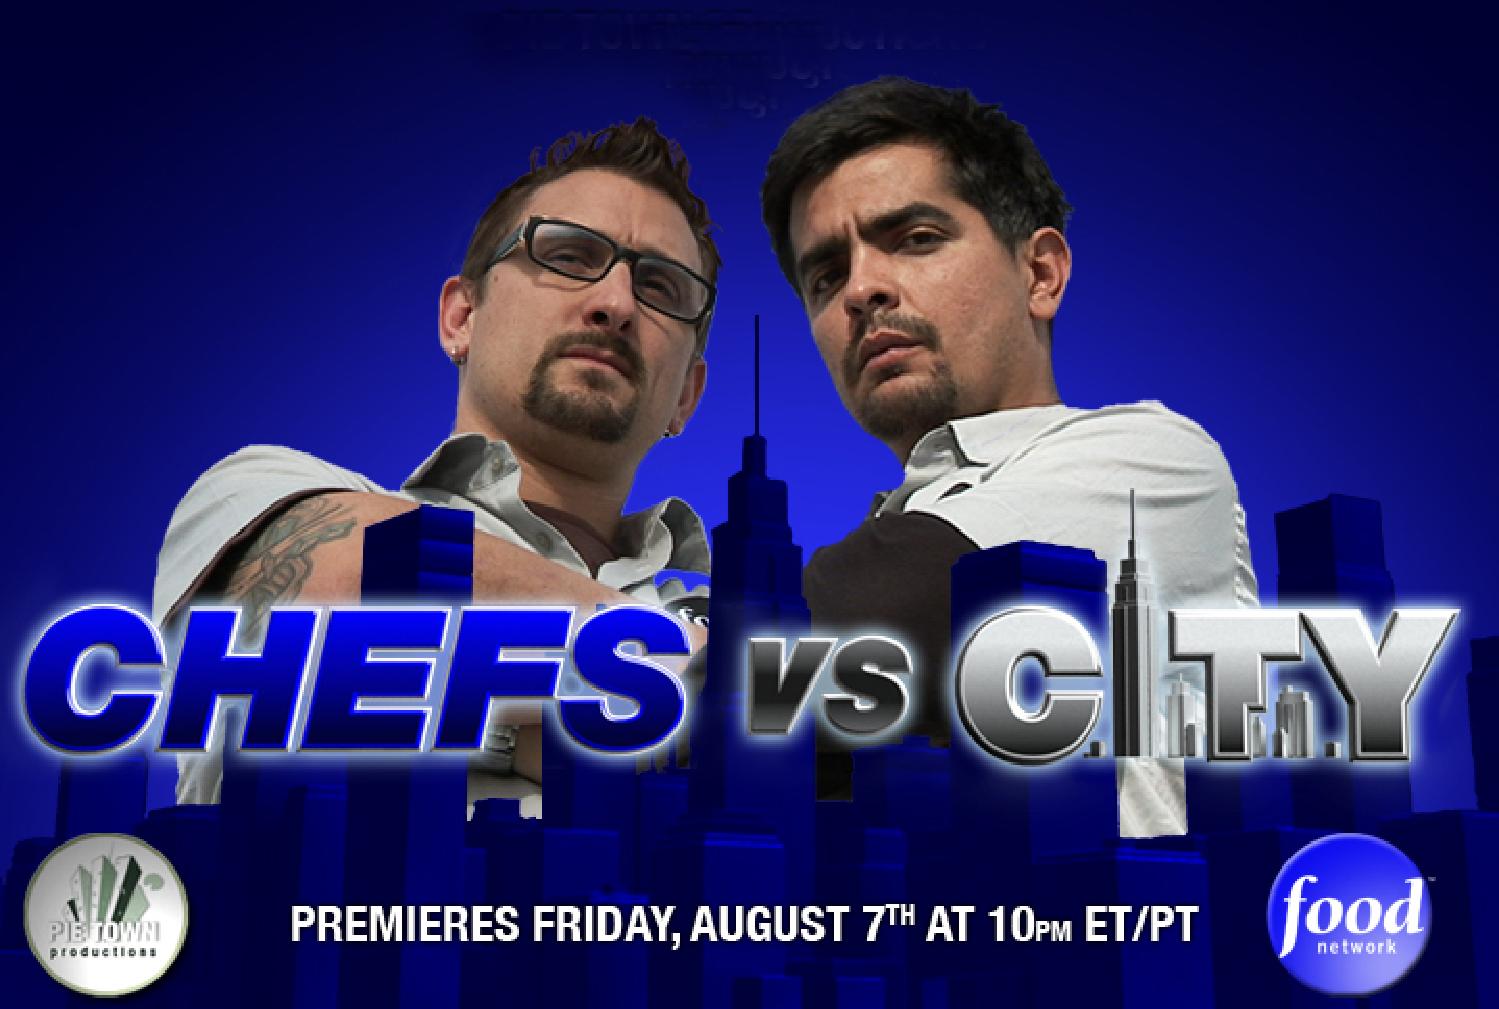 Chef vs City